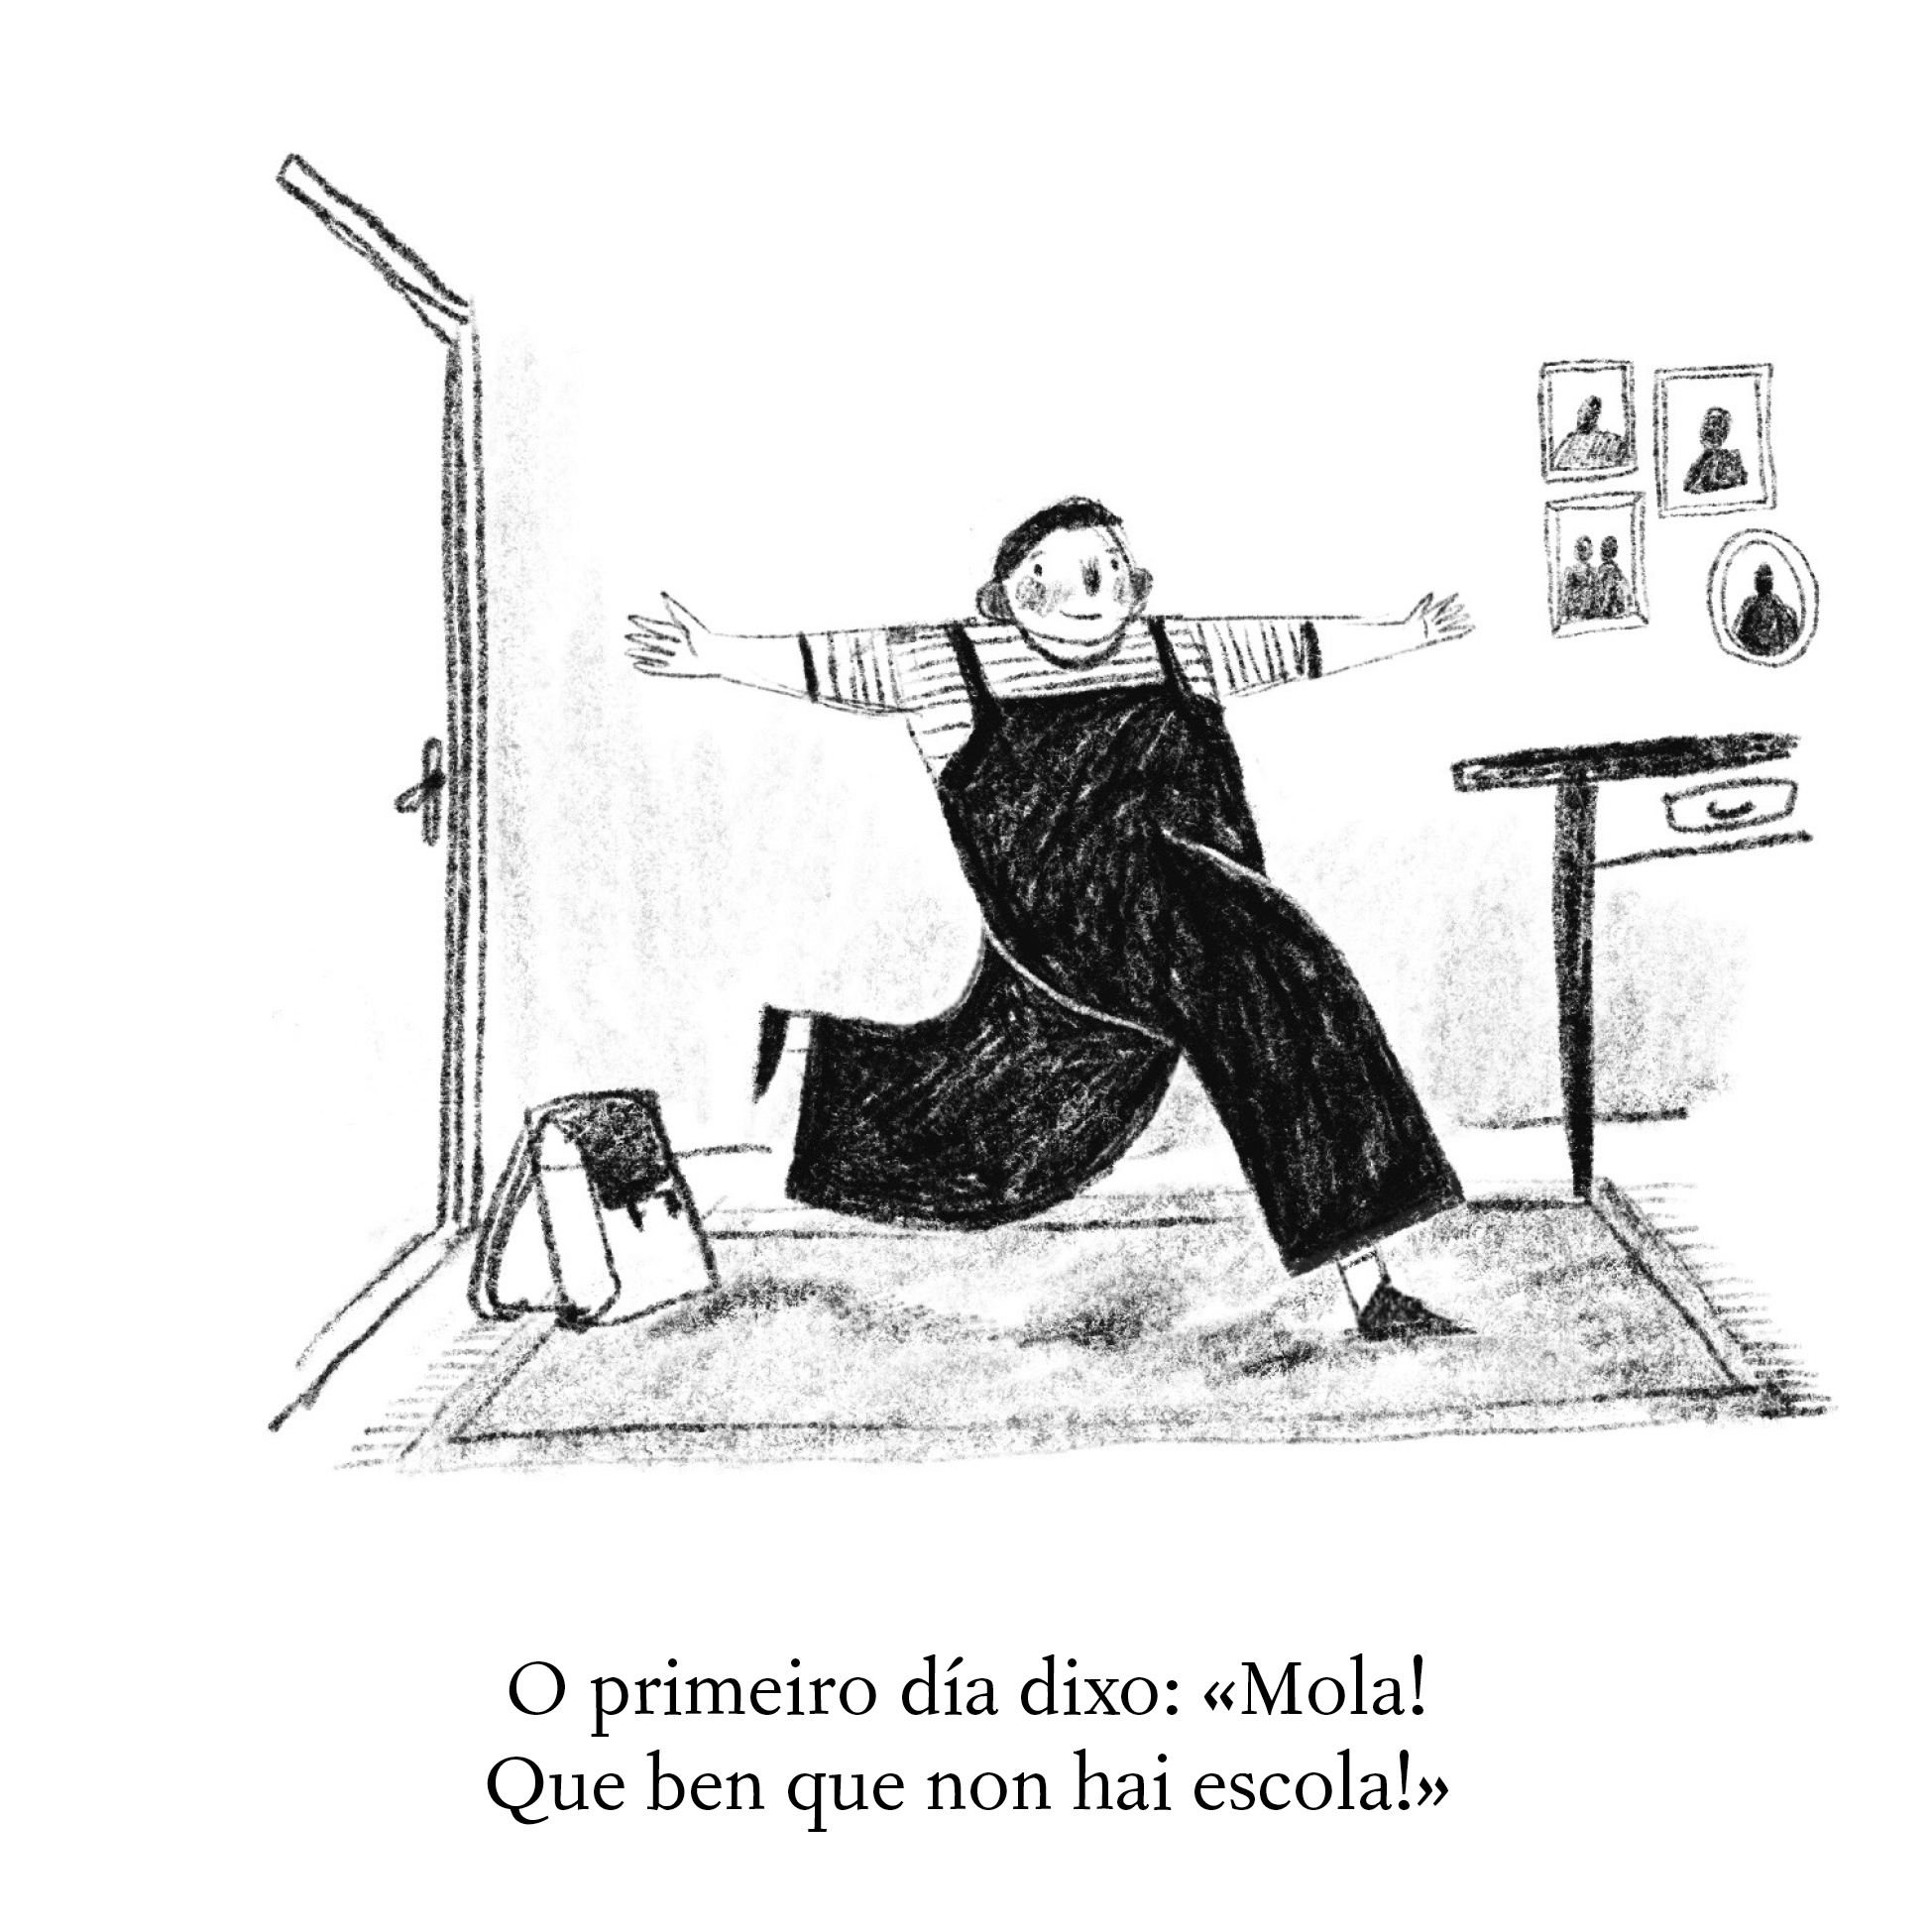 #euquedonacasa - primeiro